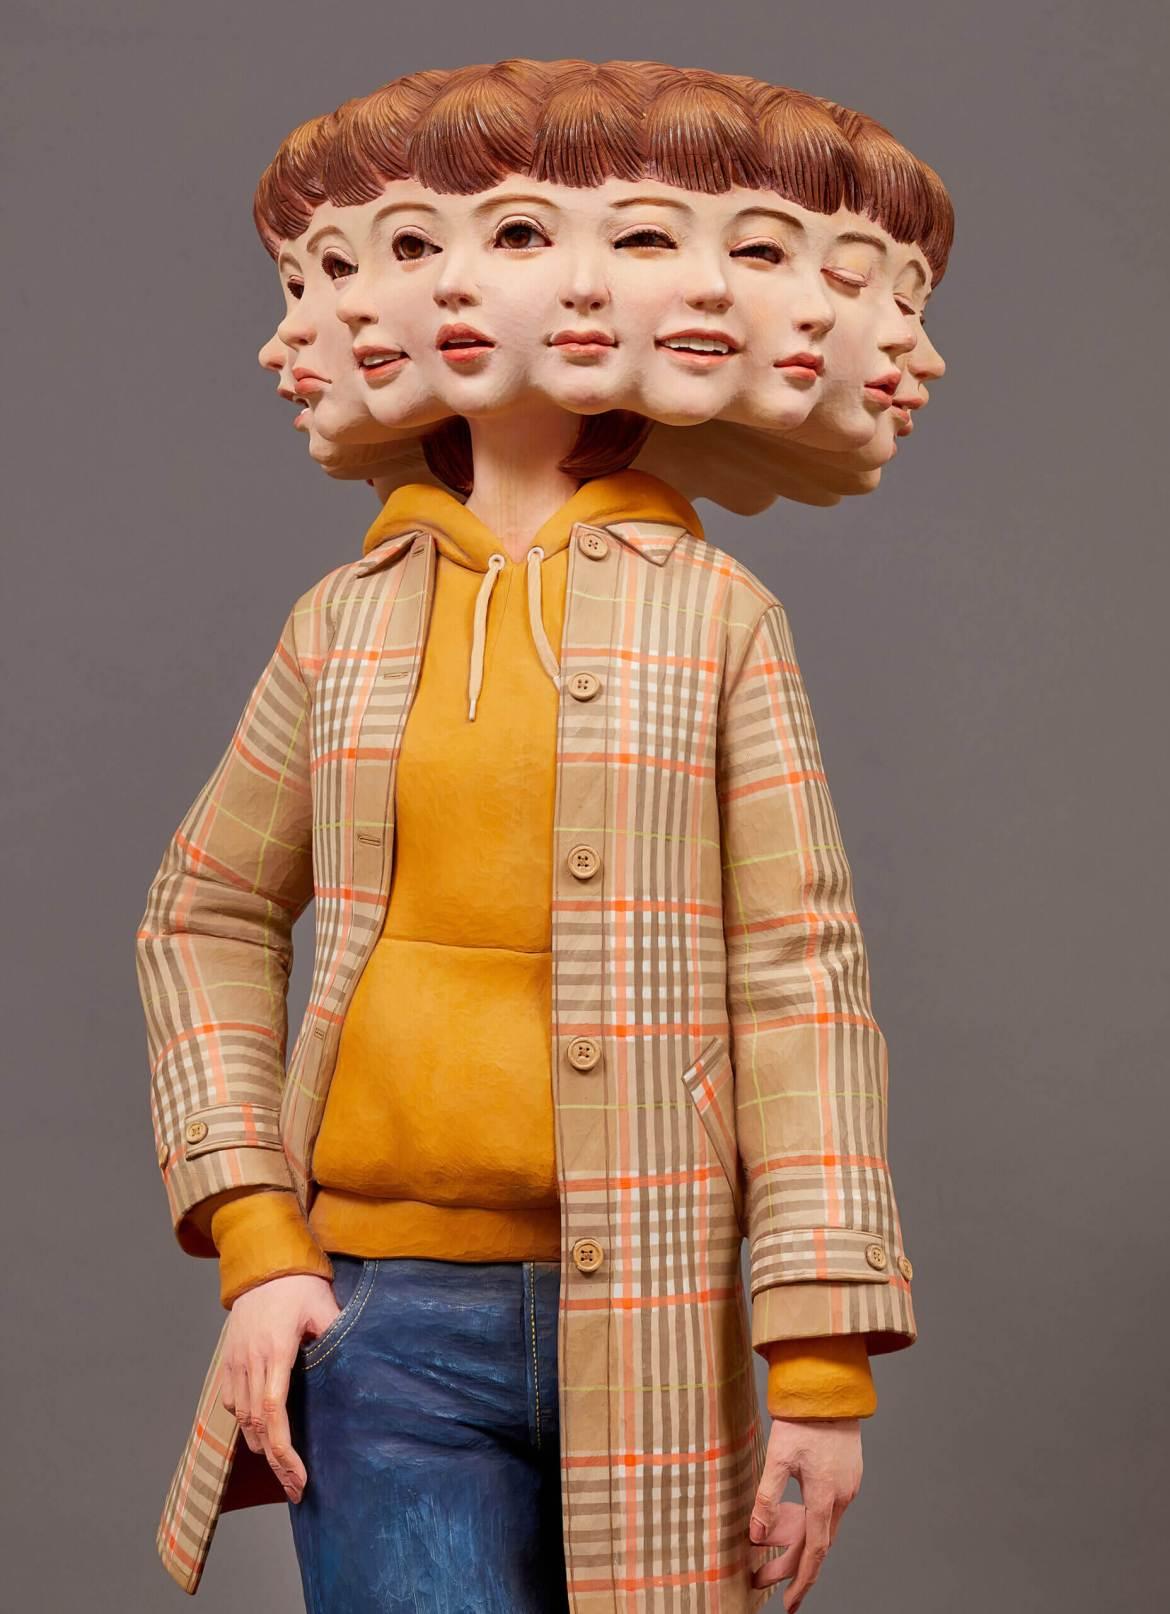 Wooden Sculpture by Yoshitoshi Kanemaki